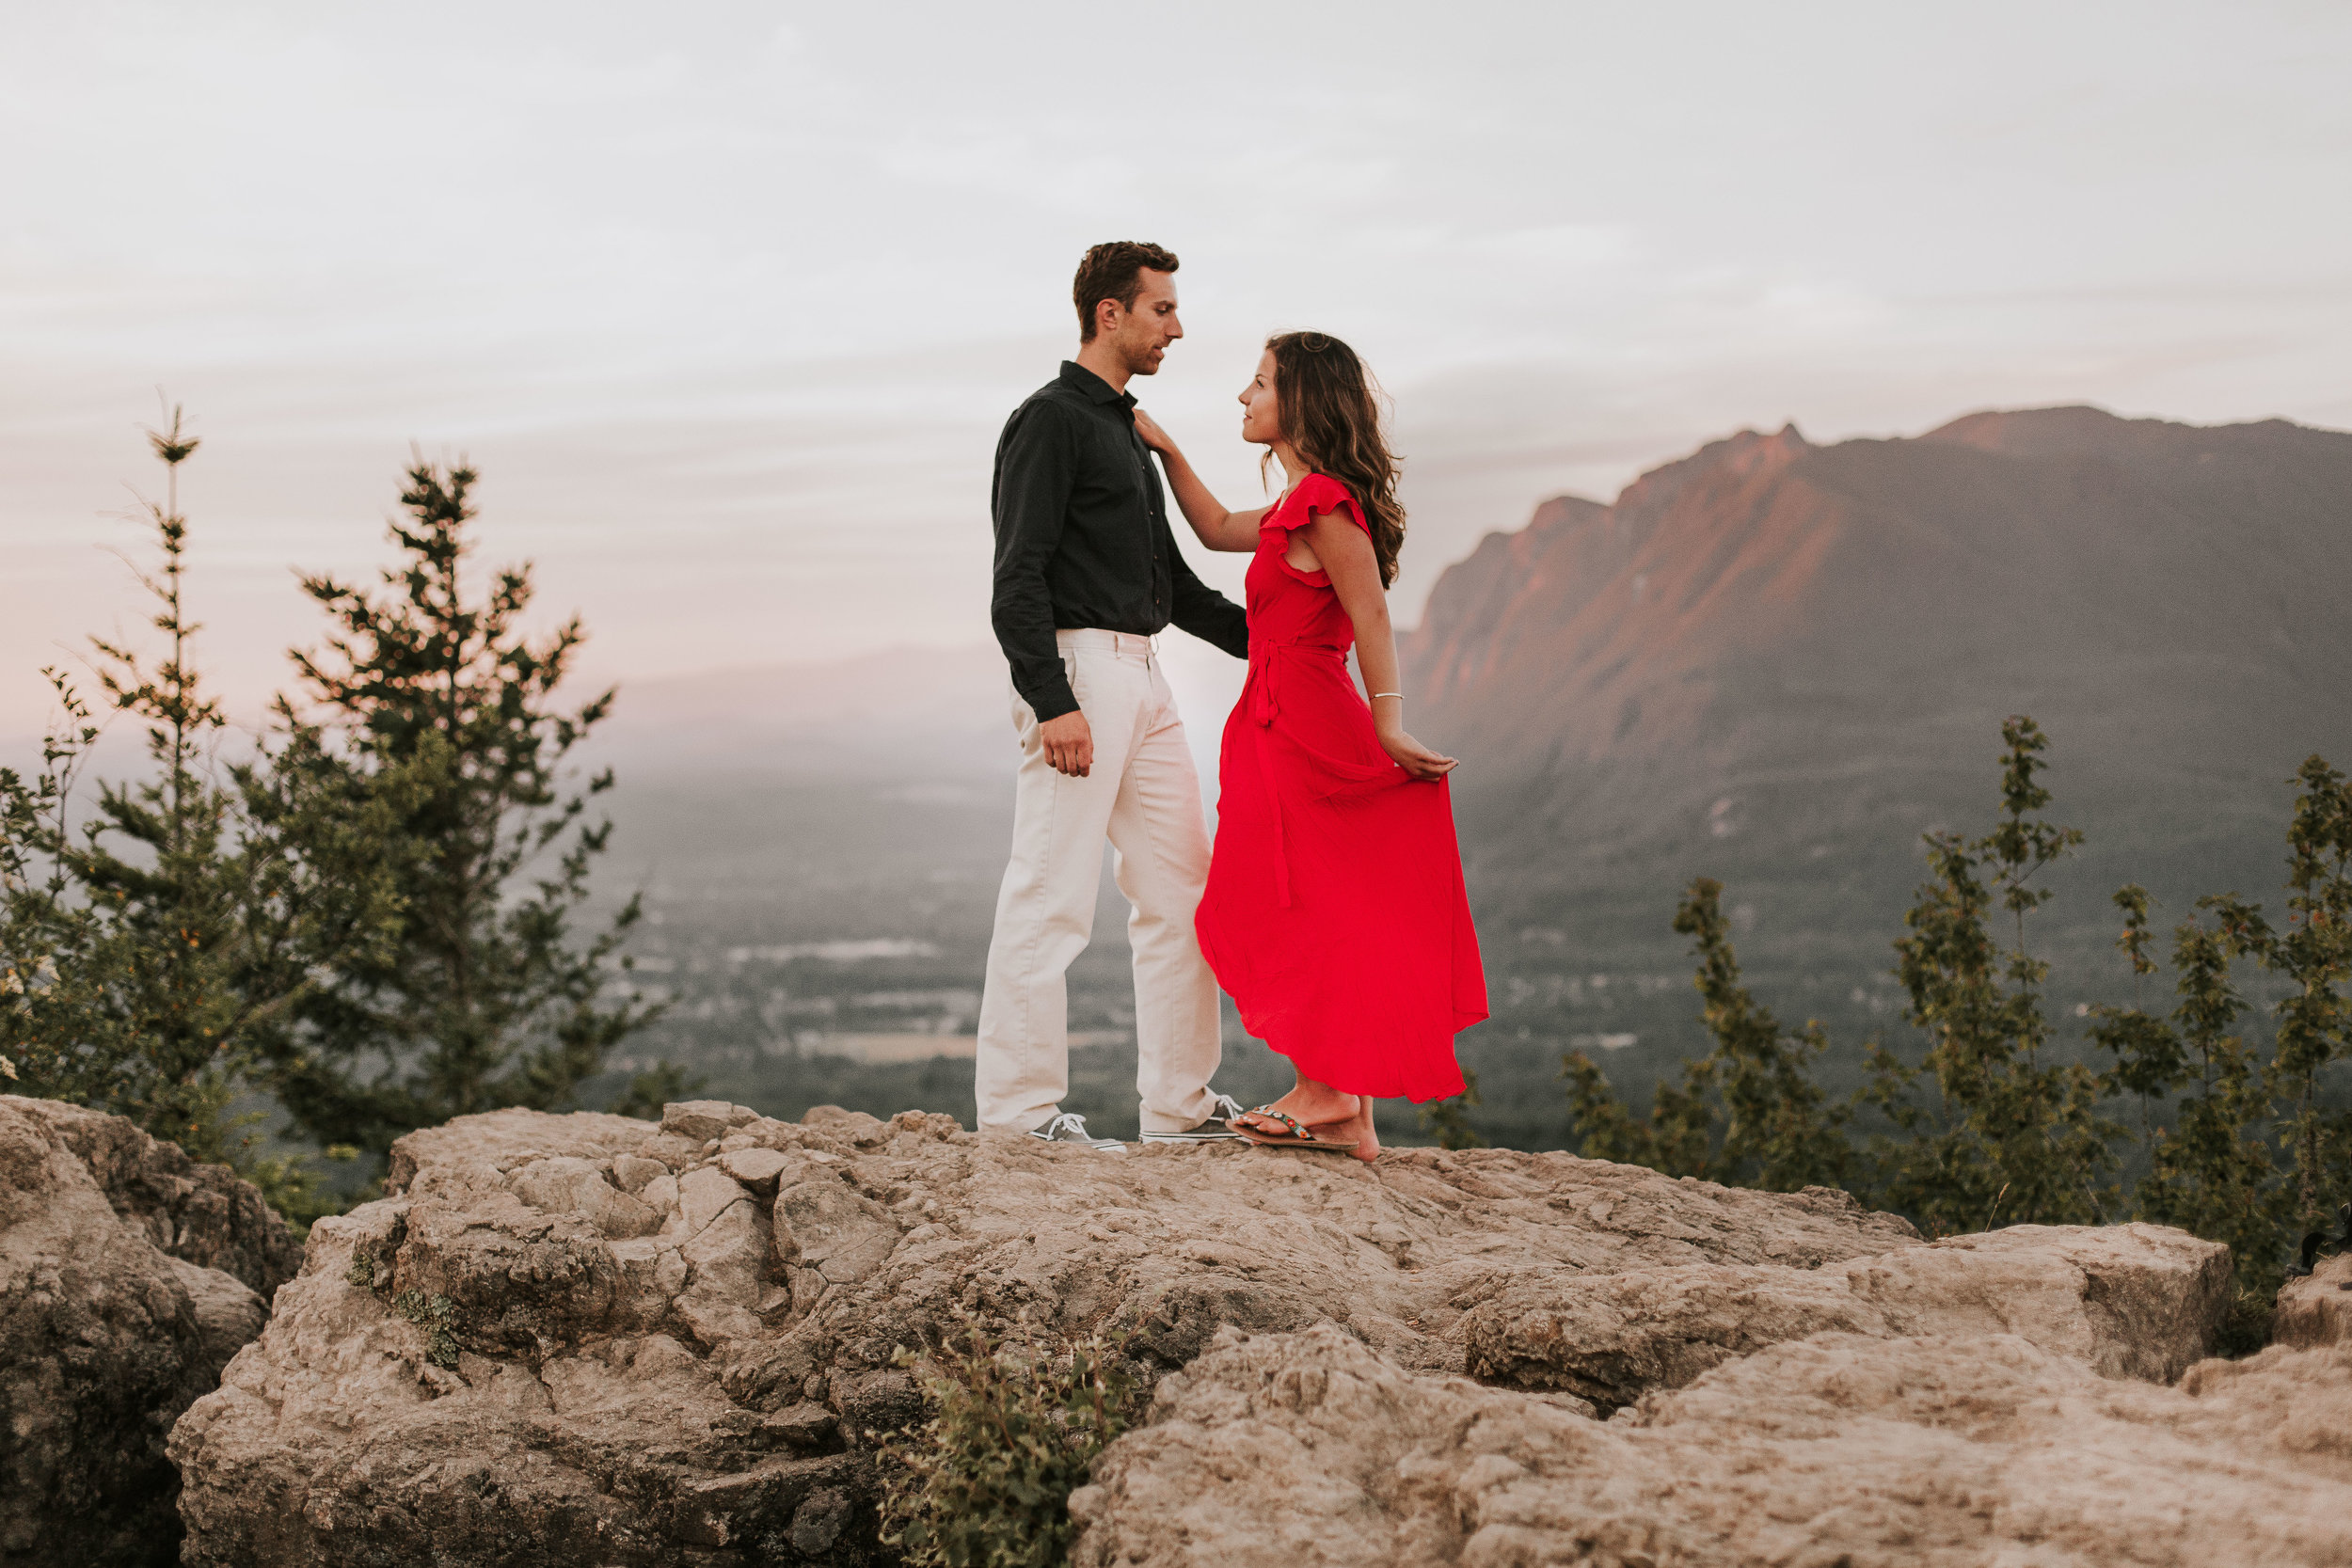 nicole-daacke-photography-rattlesnake-ridge-adventurous-engagement-session-hiking-seattle-washington-destinatino-elopement-intimate-wedding-photographer-18.jpg